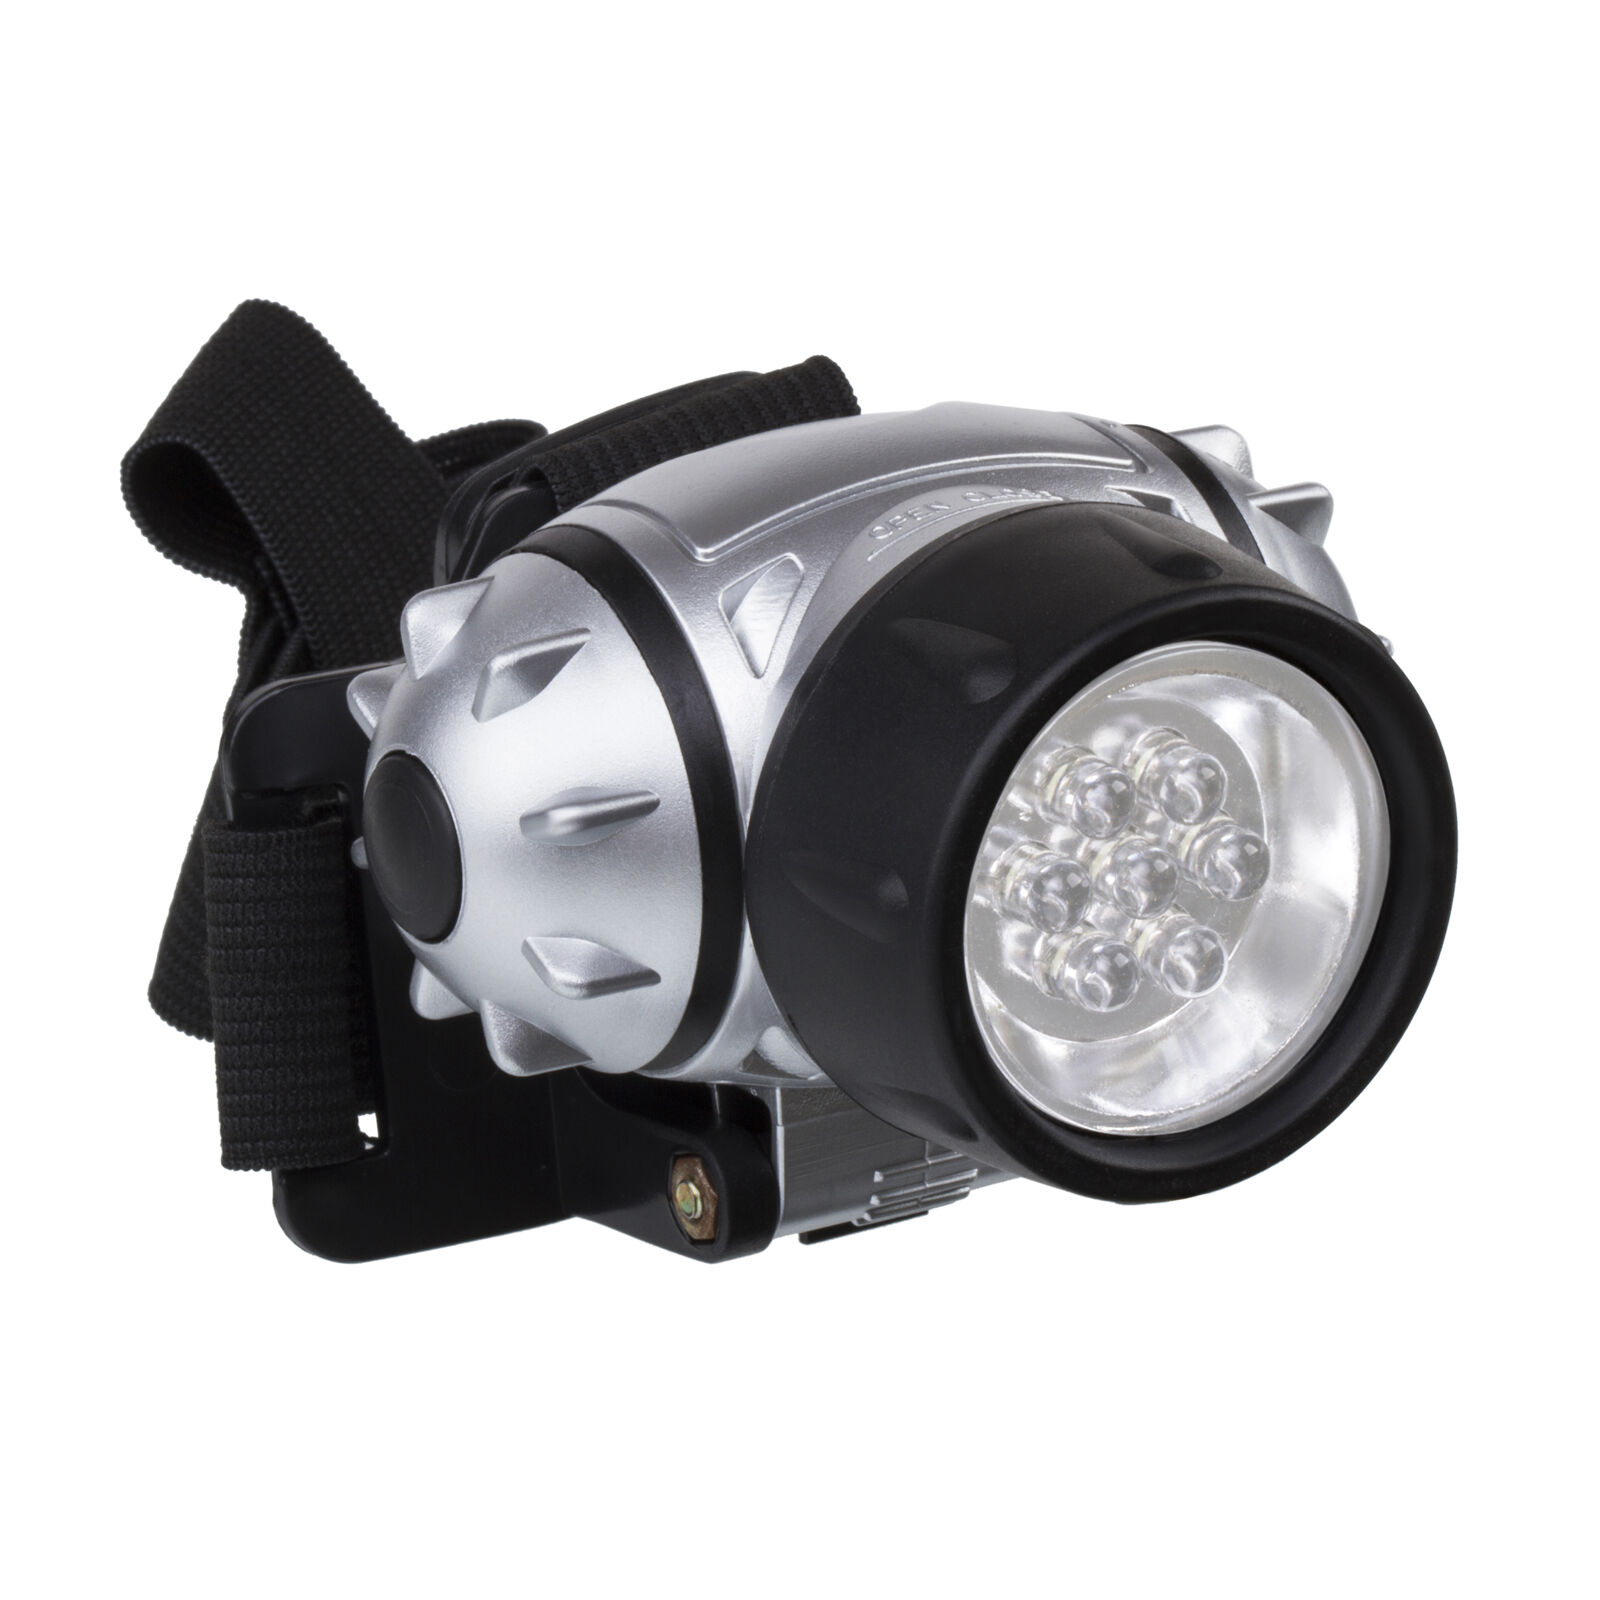 2x 1000LM LED Biking Hiking Headlamp Flashlight Torch Headlight Cree Camping & Hiking